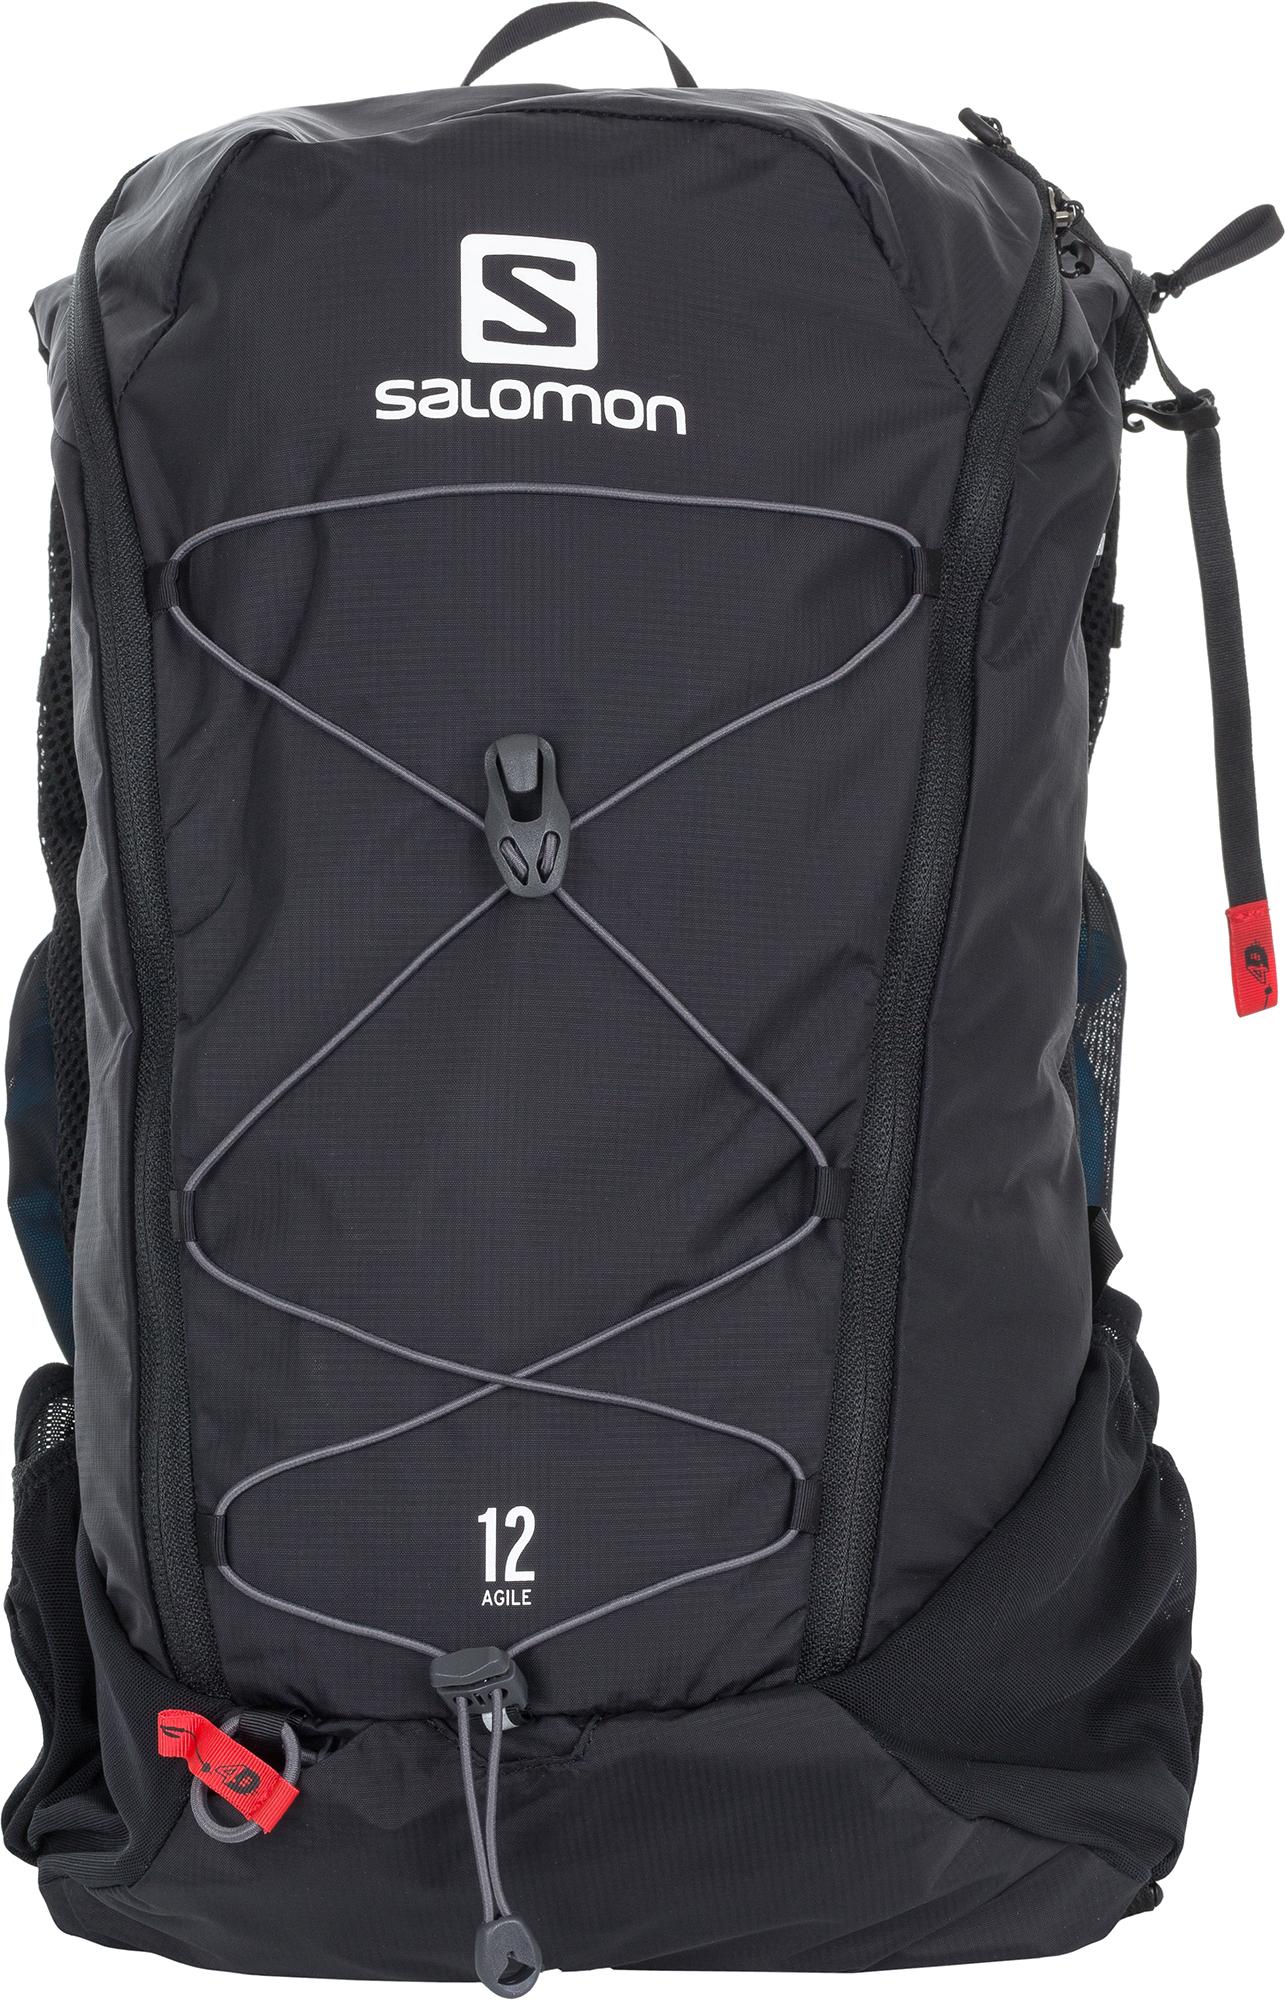 Salomon Рюкзак Salomon Agile 12